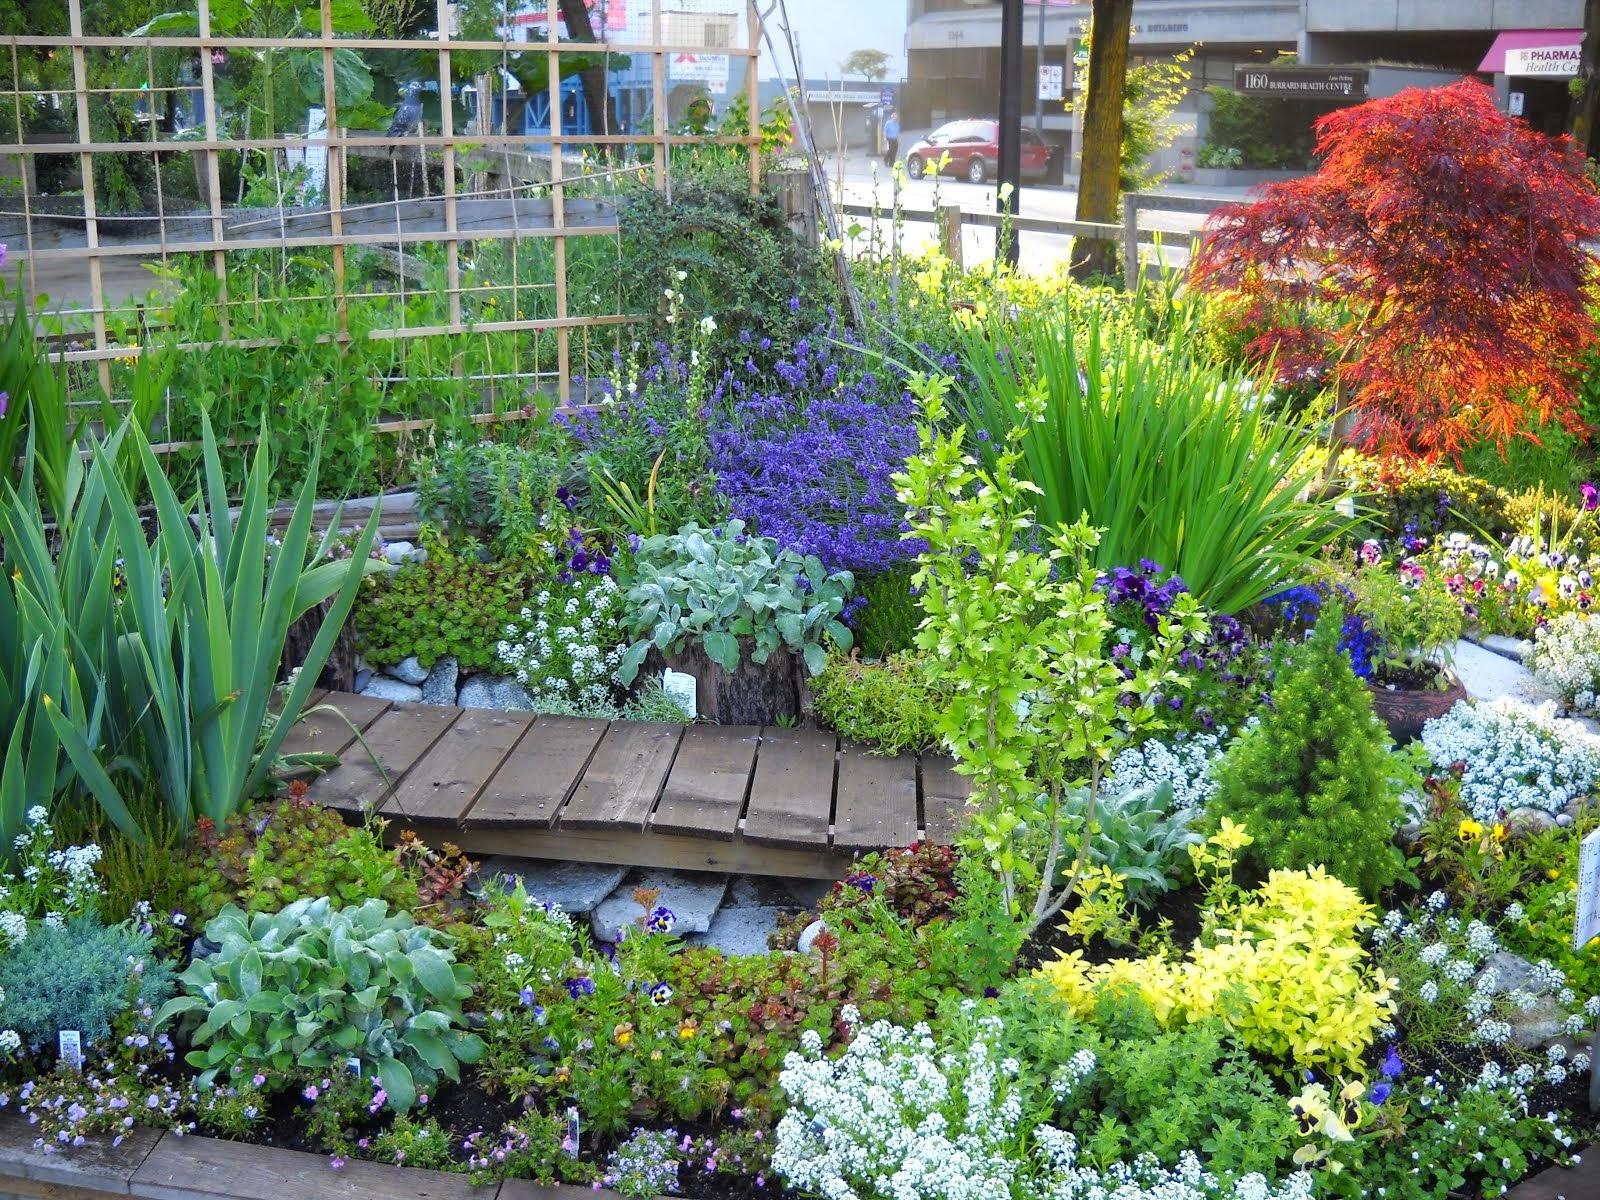 Davies Street Community Garden